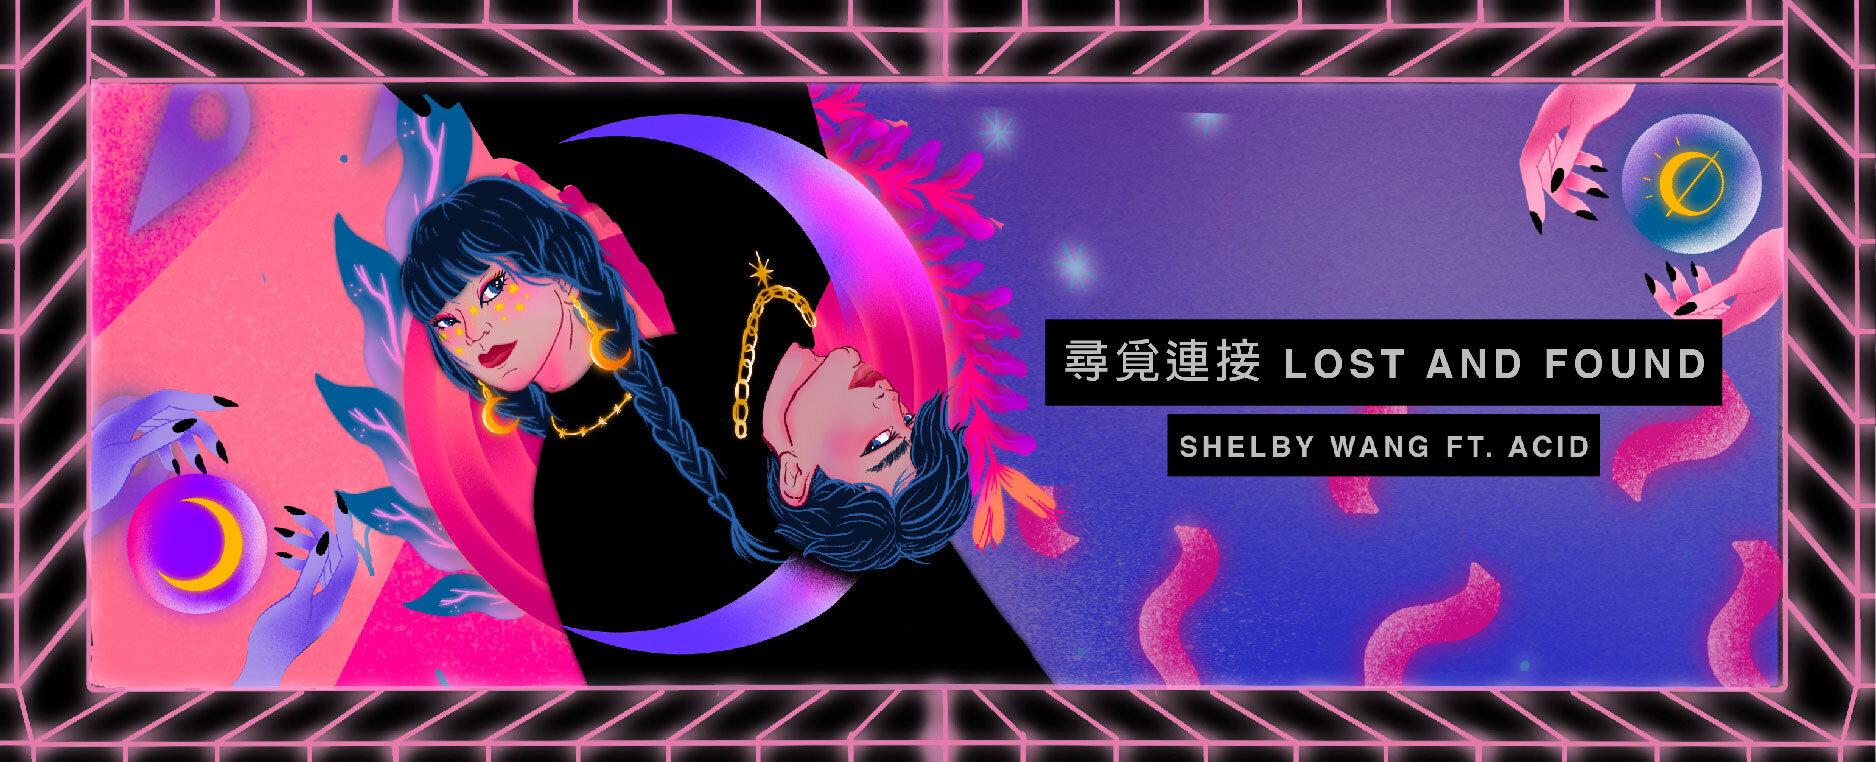 王曉敏 (Shelby Wang) | 尋覓連接 (feat. Acid)